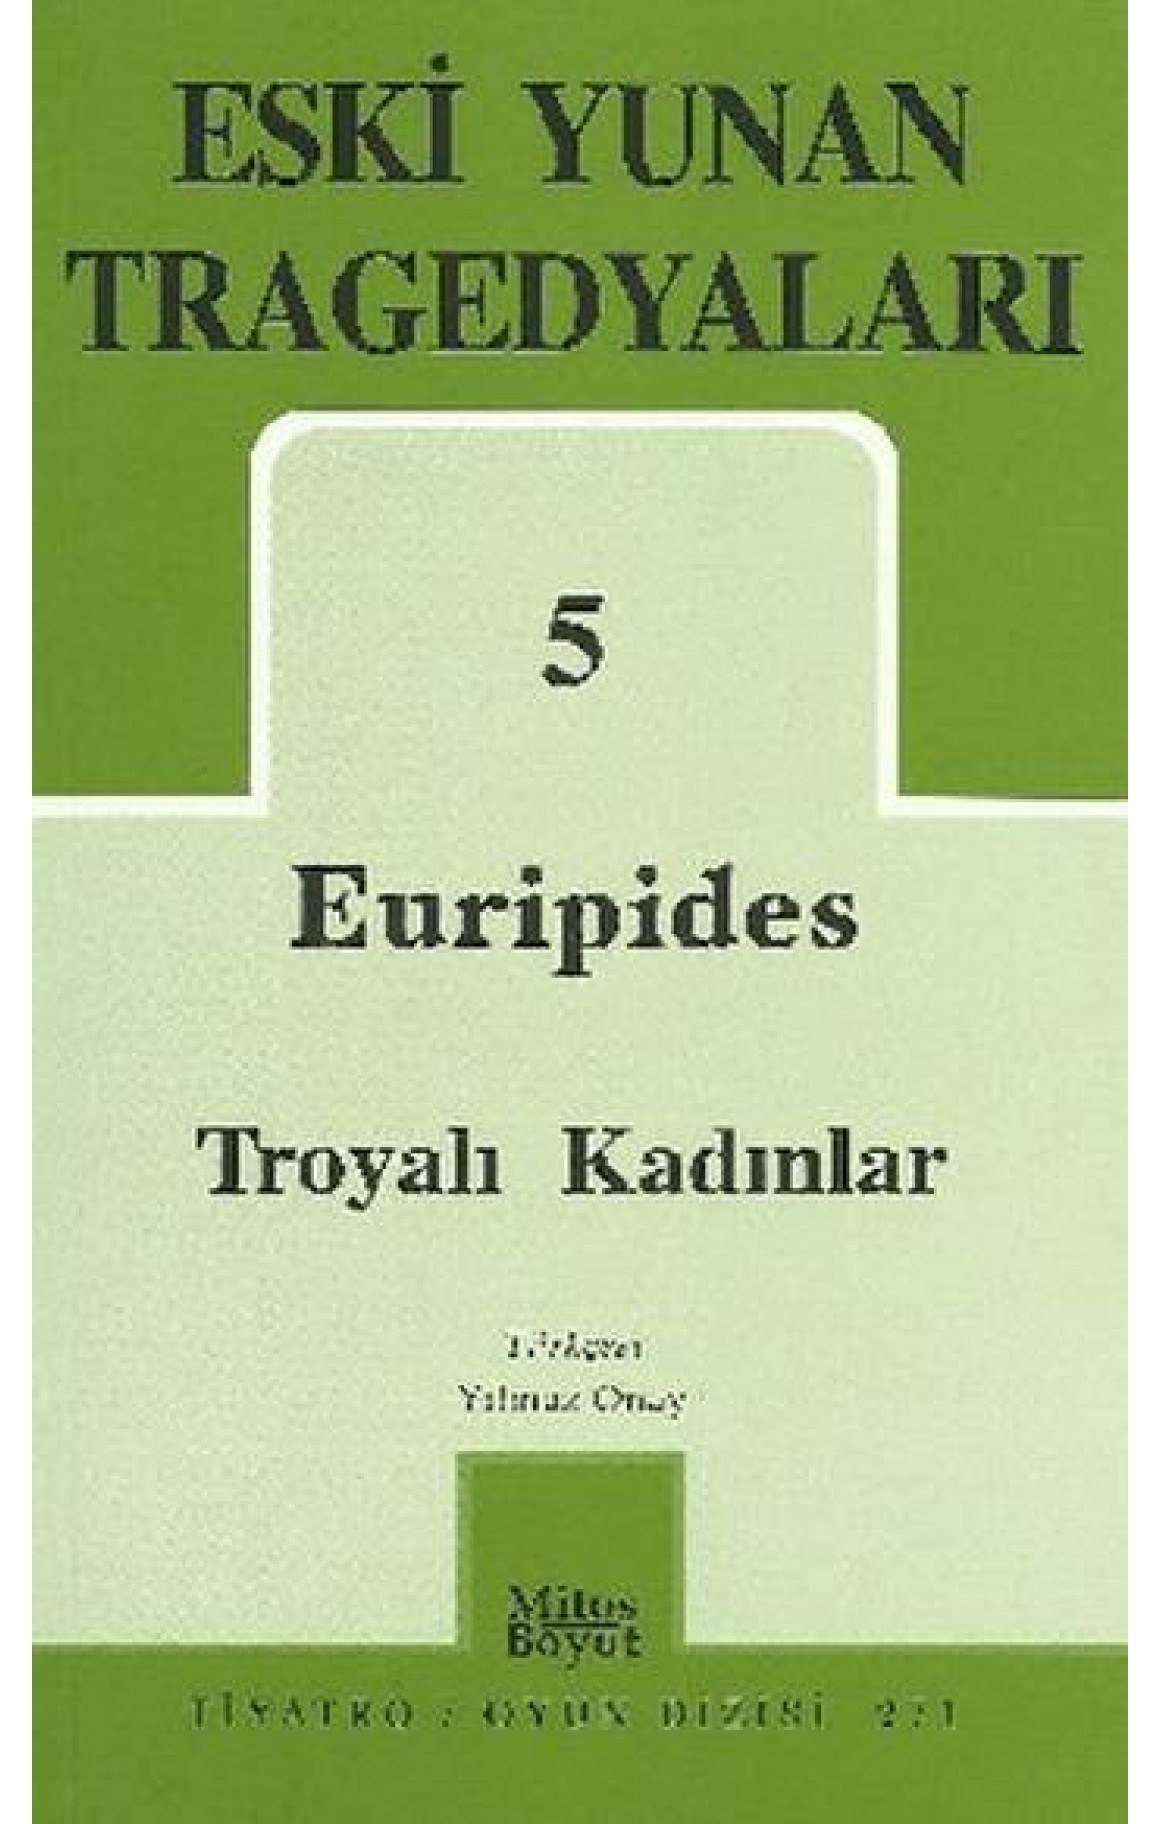 Eski Yunan Tragedyaları 5 - Euripides - Troyalı Kadınlar